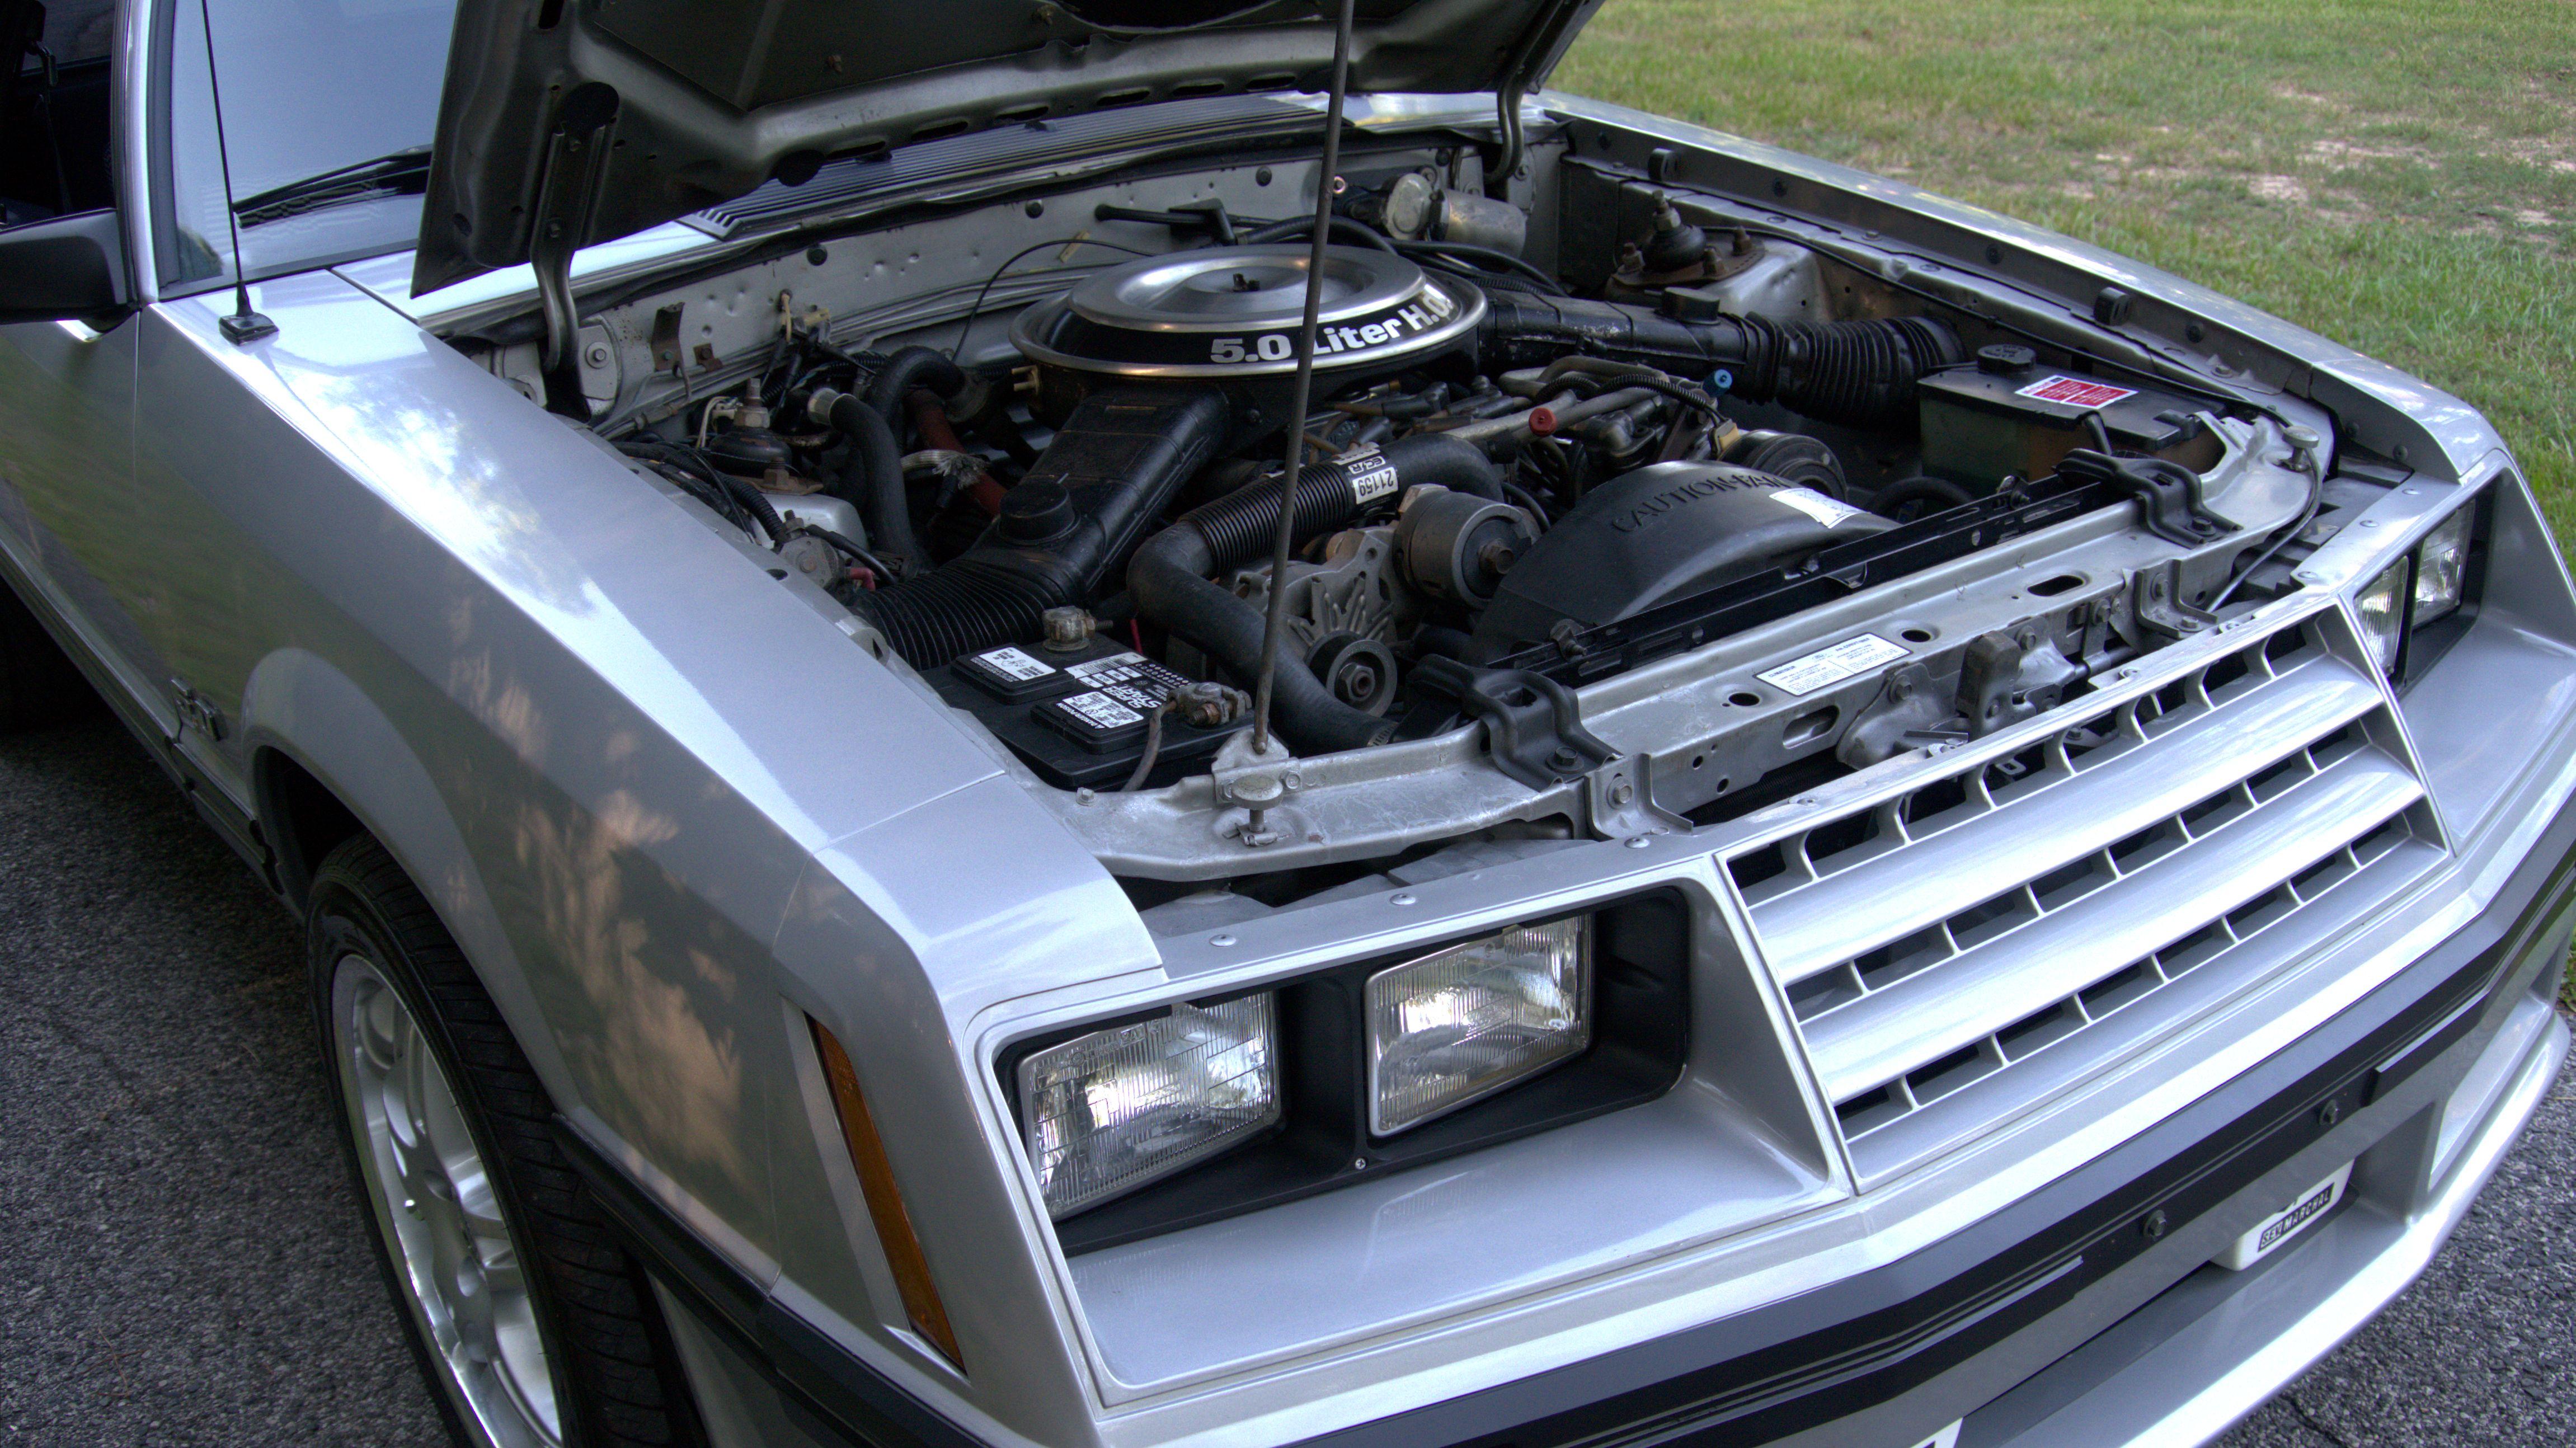 Mustang20.jpg